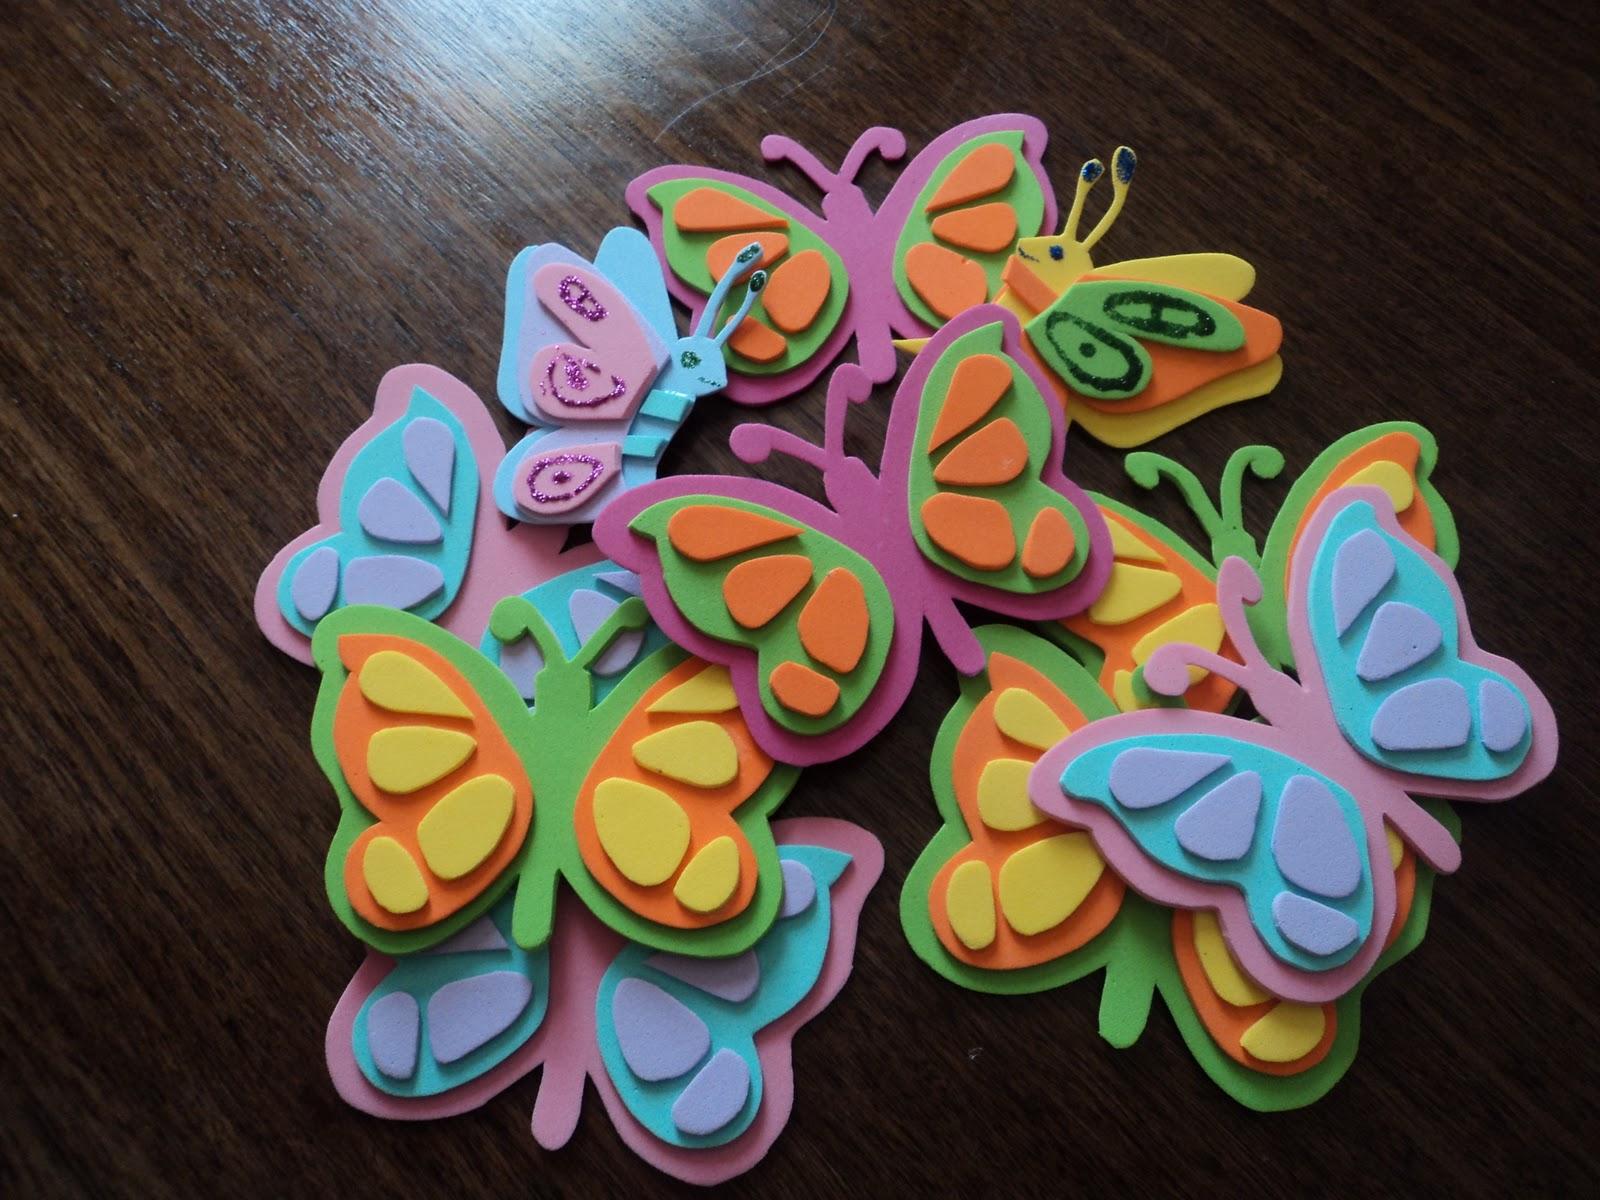 Manualidades de goma eva mariposas imagui - Como hacer mariposas de goma eva ...